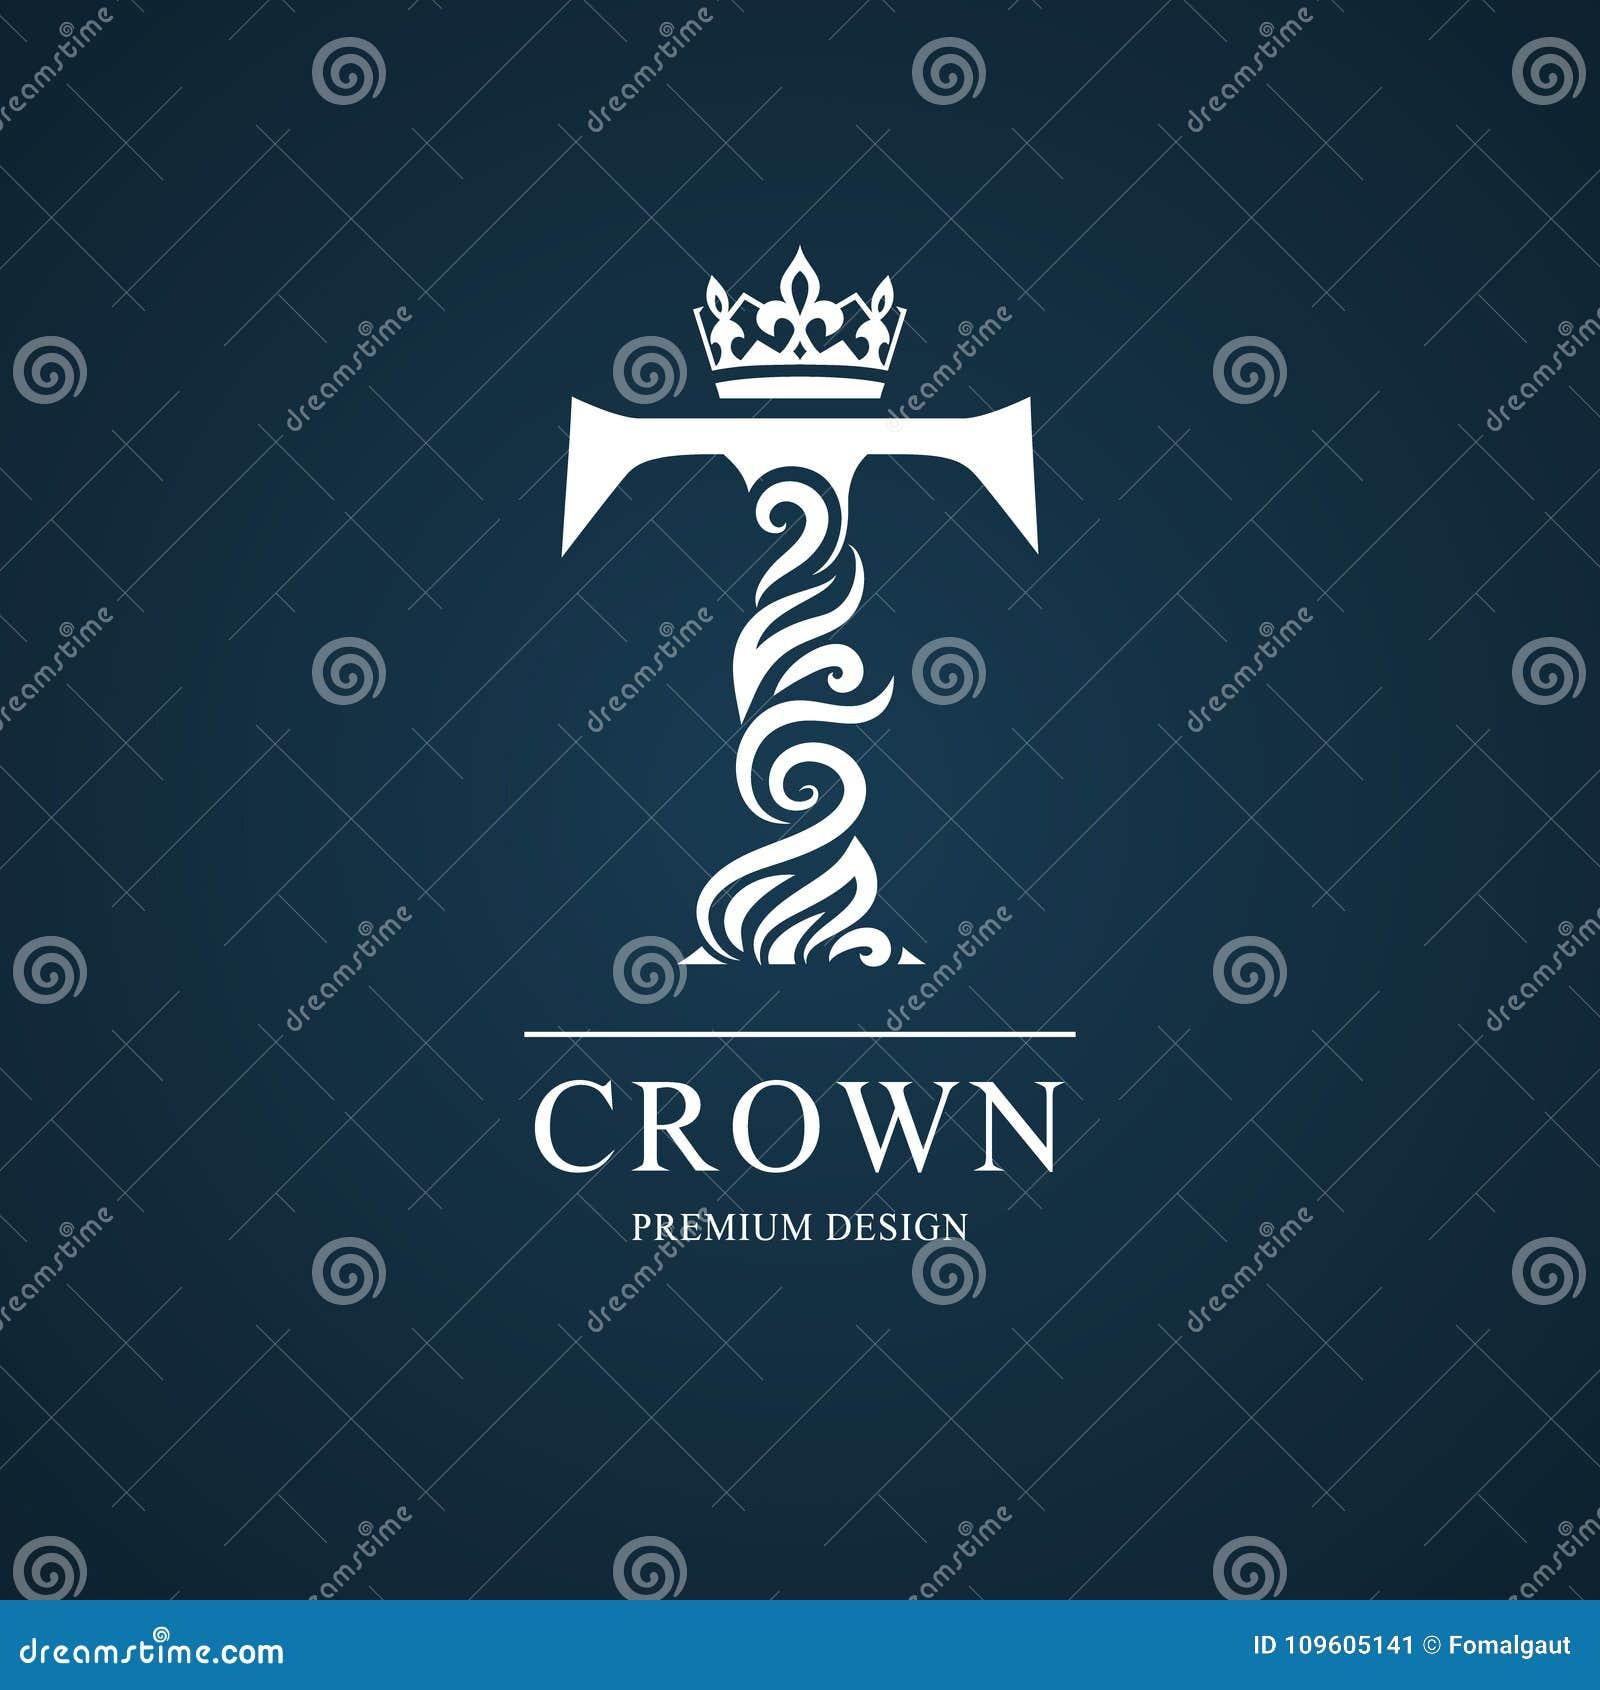 elegant letter t graceful royal style calligraphic